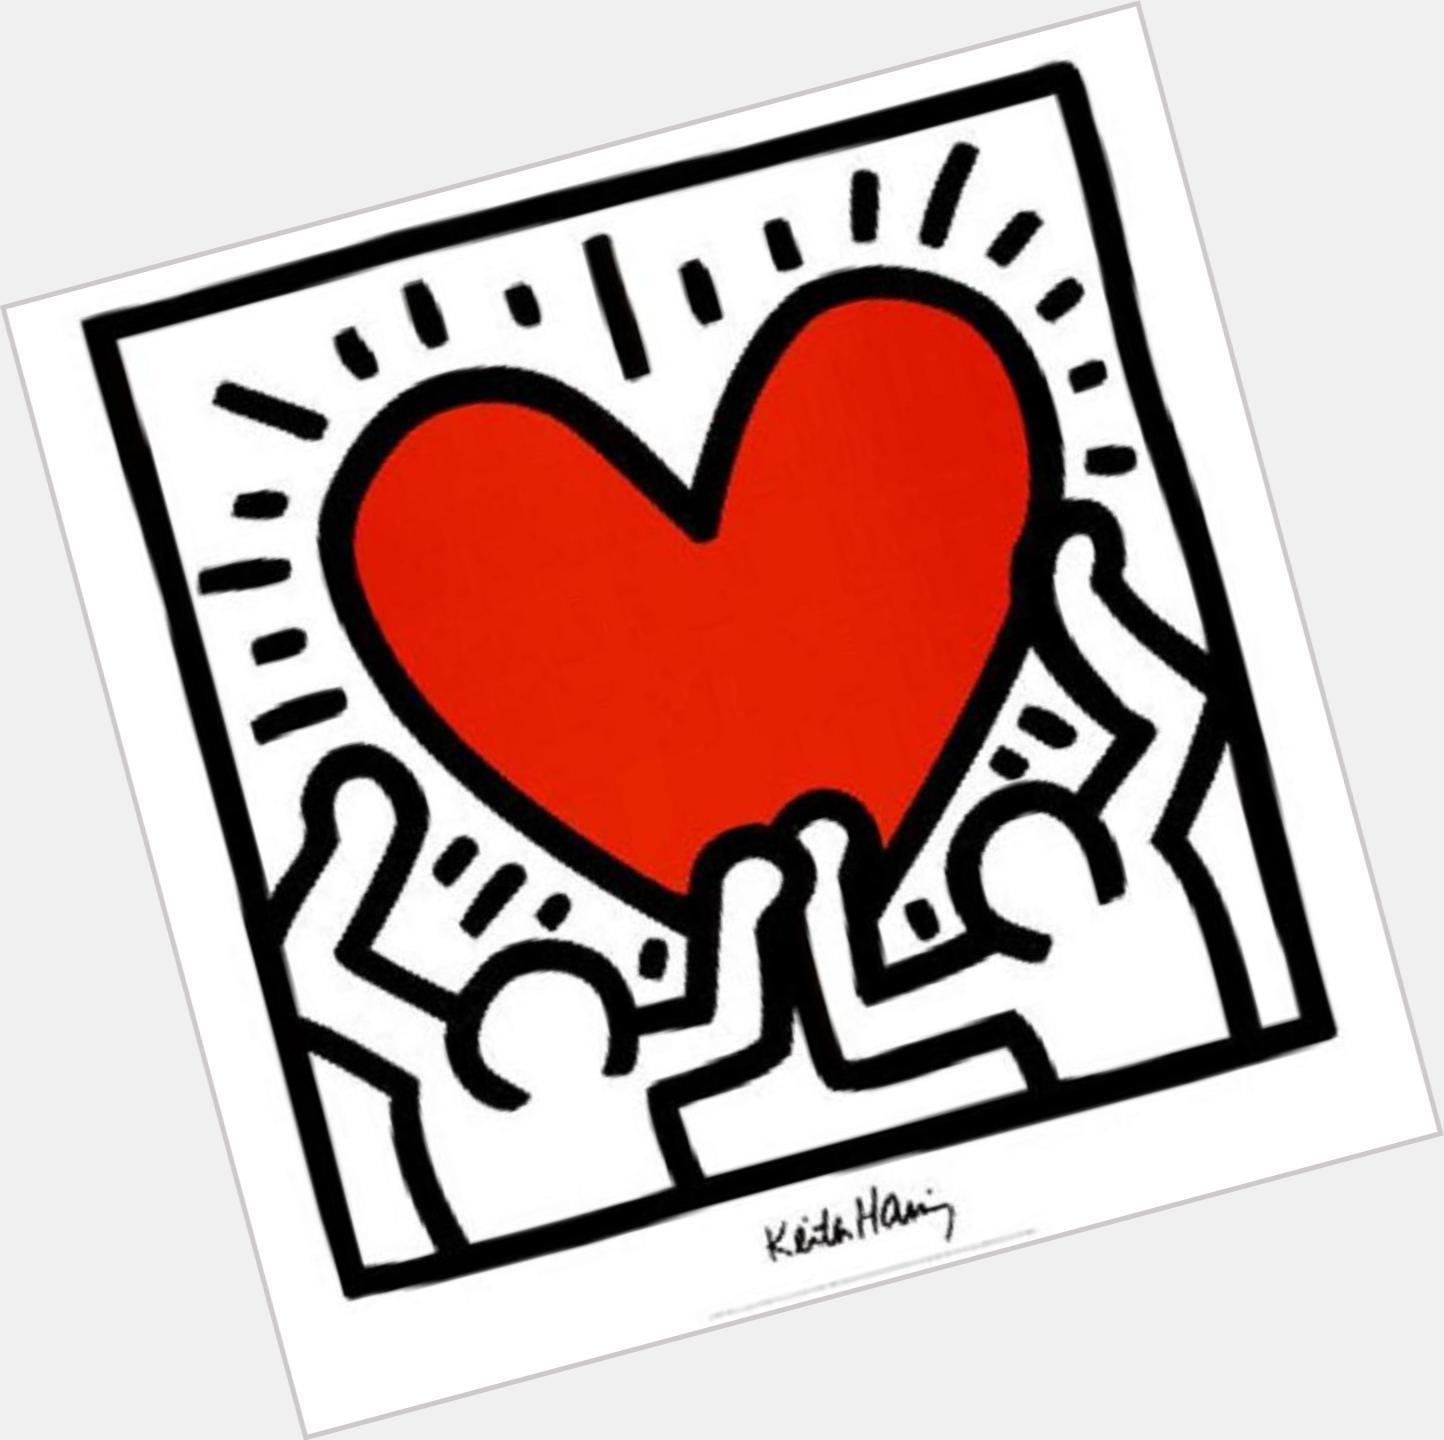 Keith Haring birthday 2015